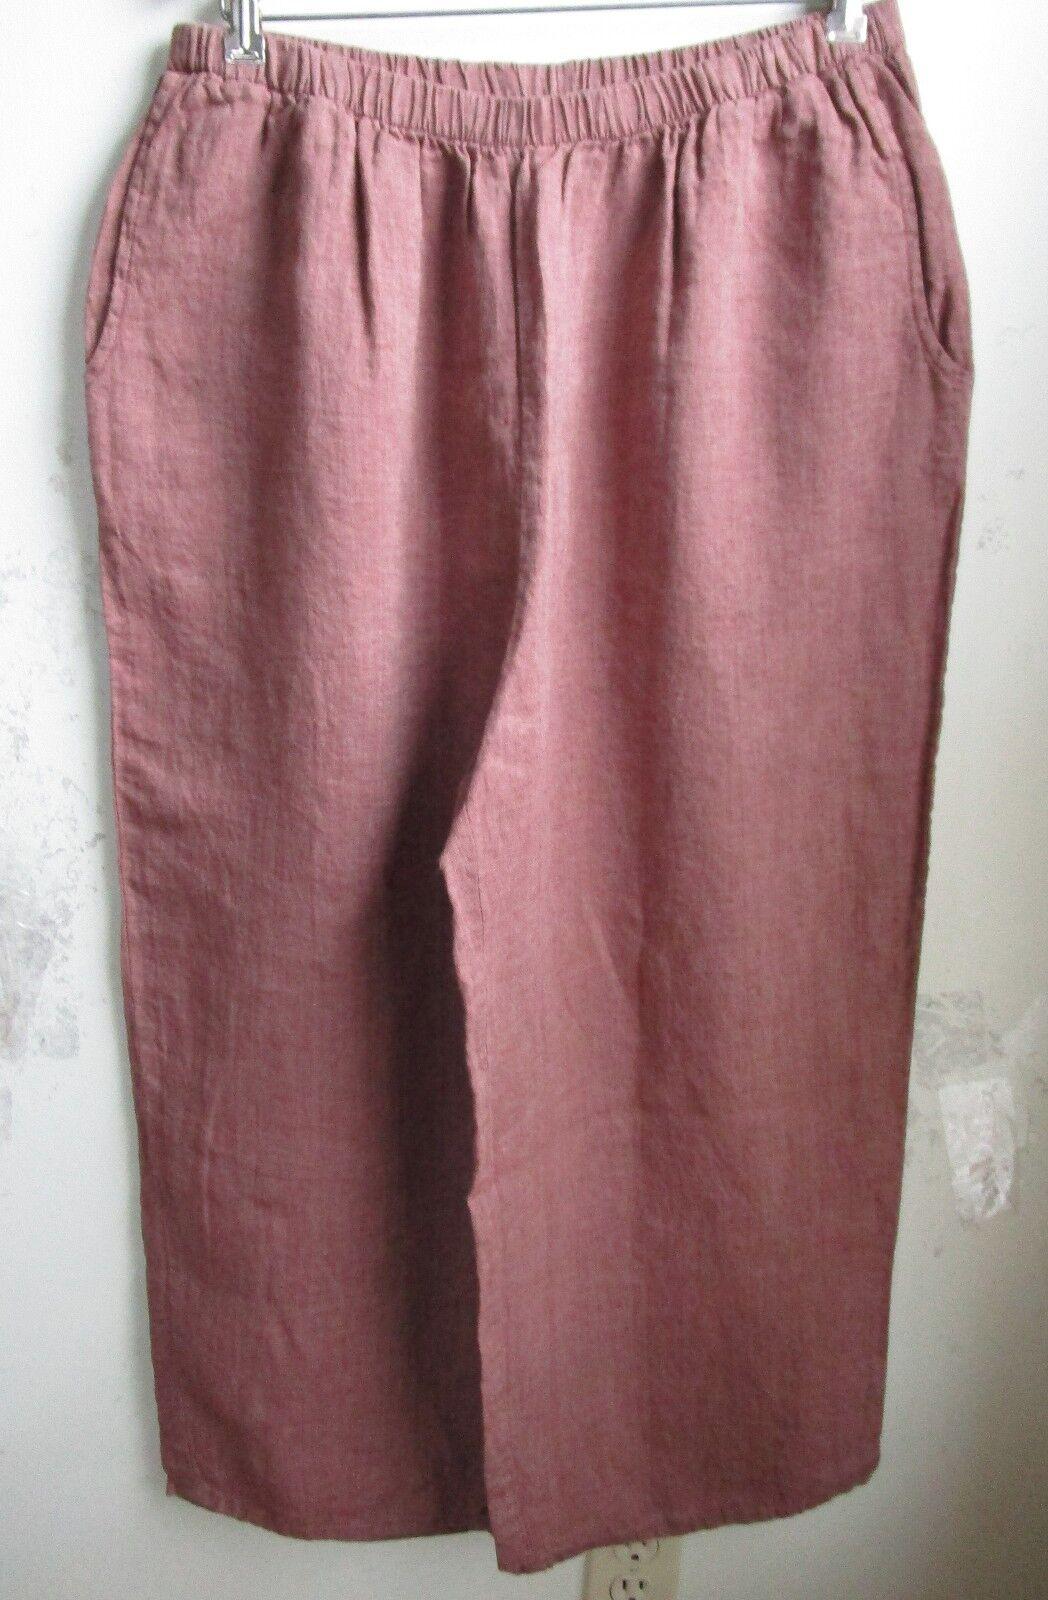 FLAX Designs   LINEN PANTS   1G  NWOT   Floods Cropped Pants  pinkWOOD